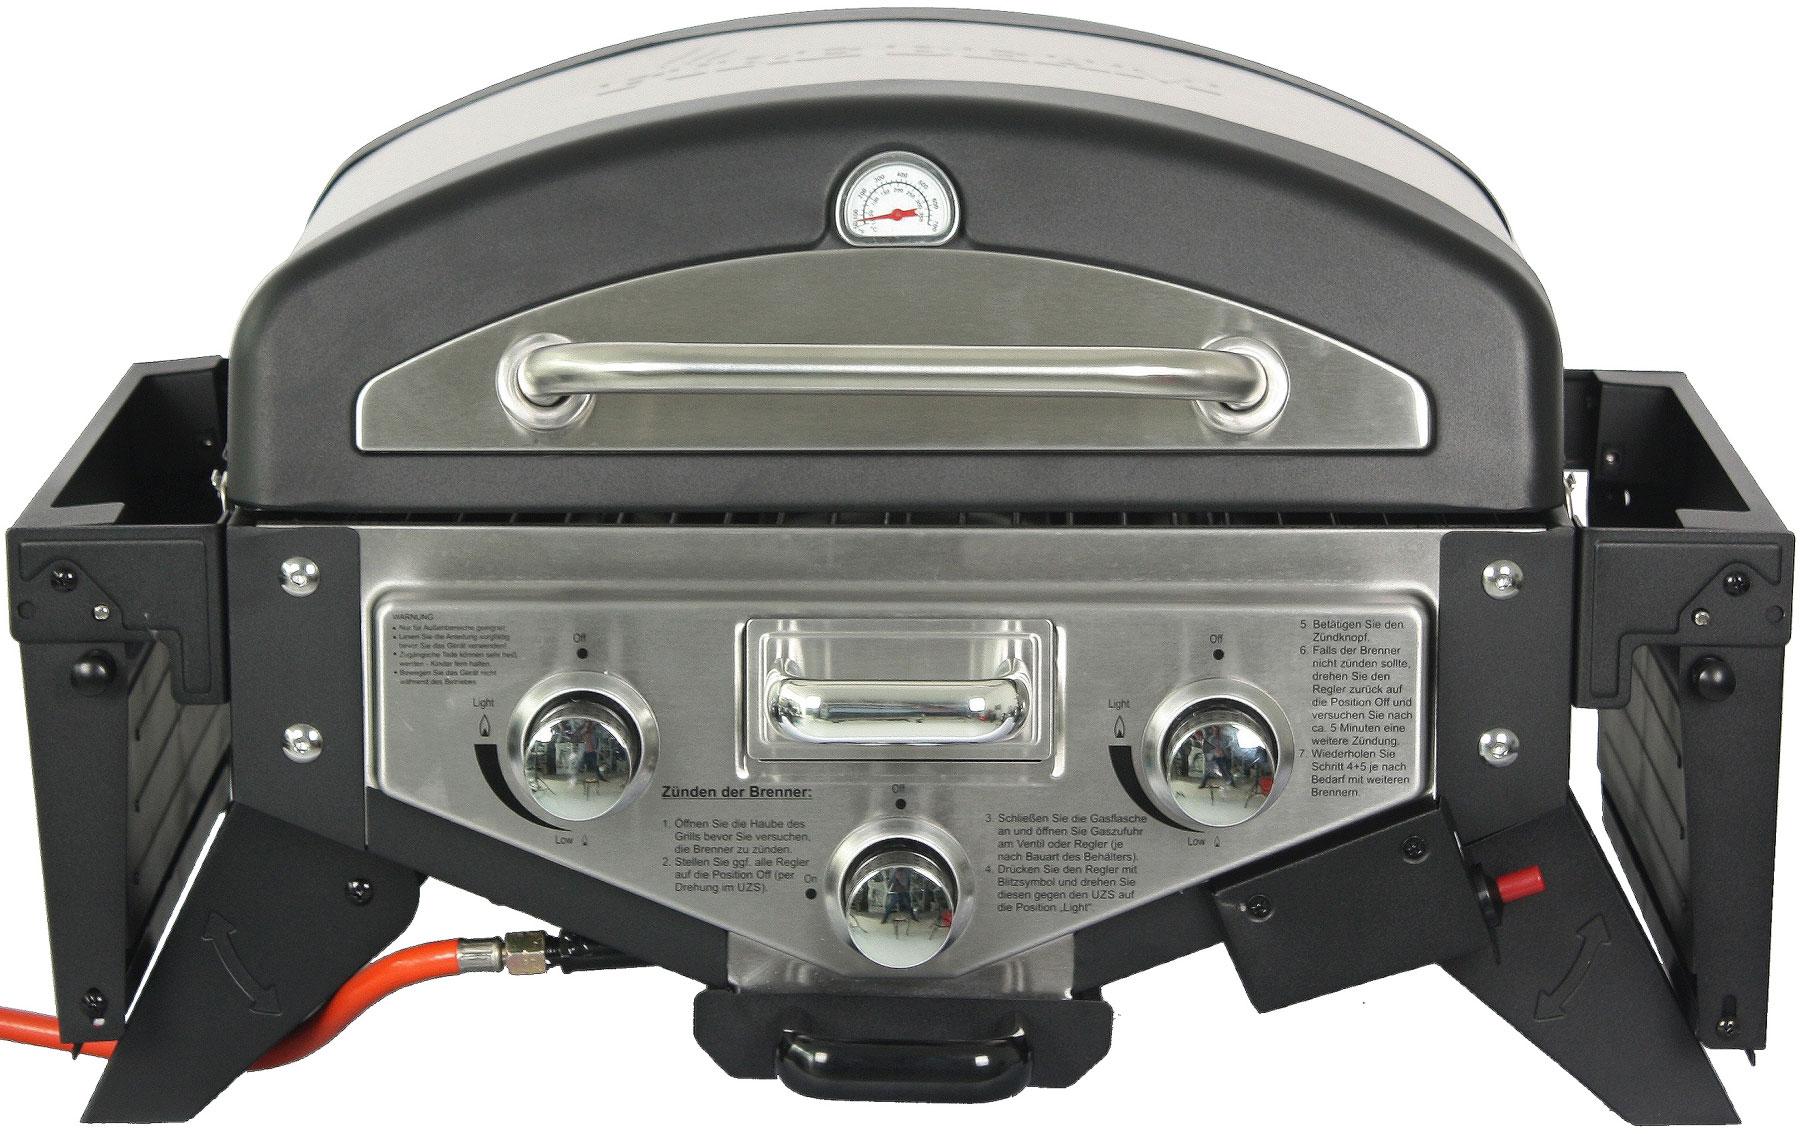 El Fuego Gasgrill / Tischgrill Medison silber Grillfläche 49x33,5cm Bild 4